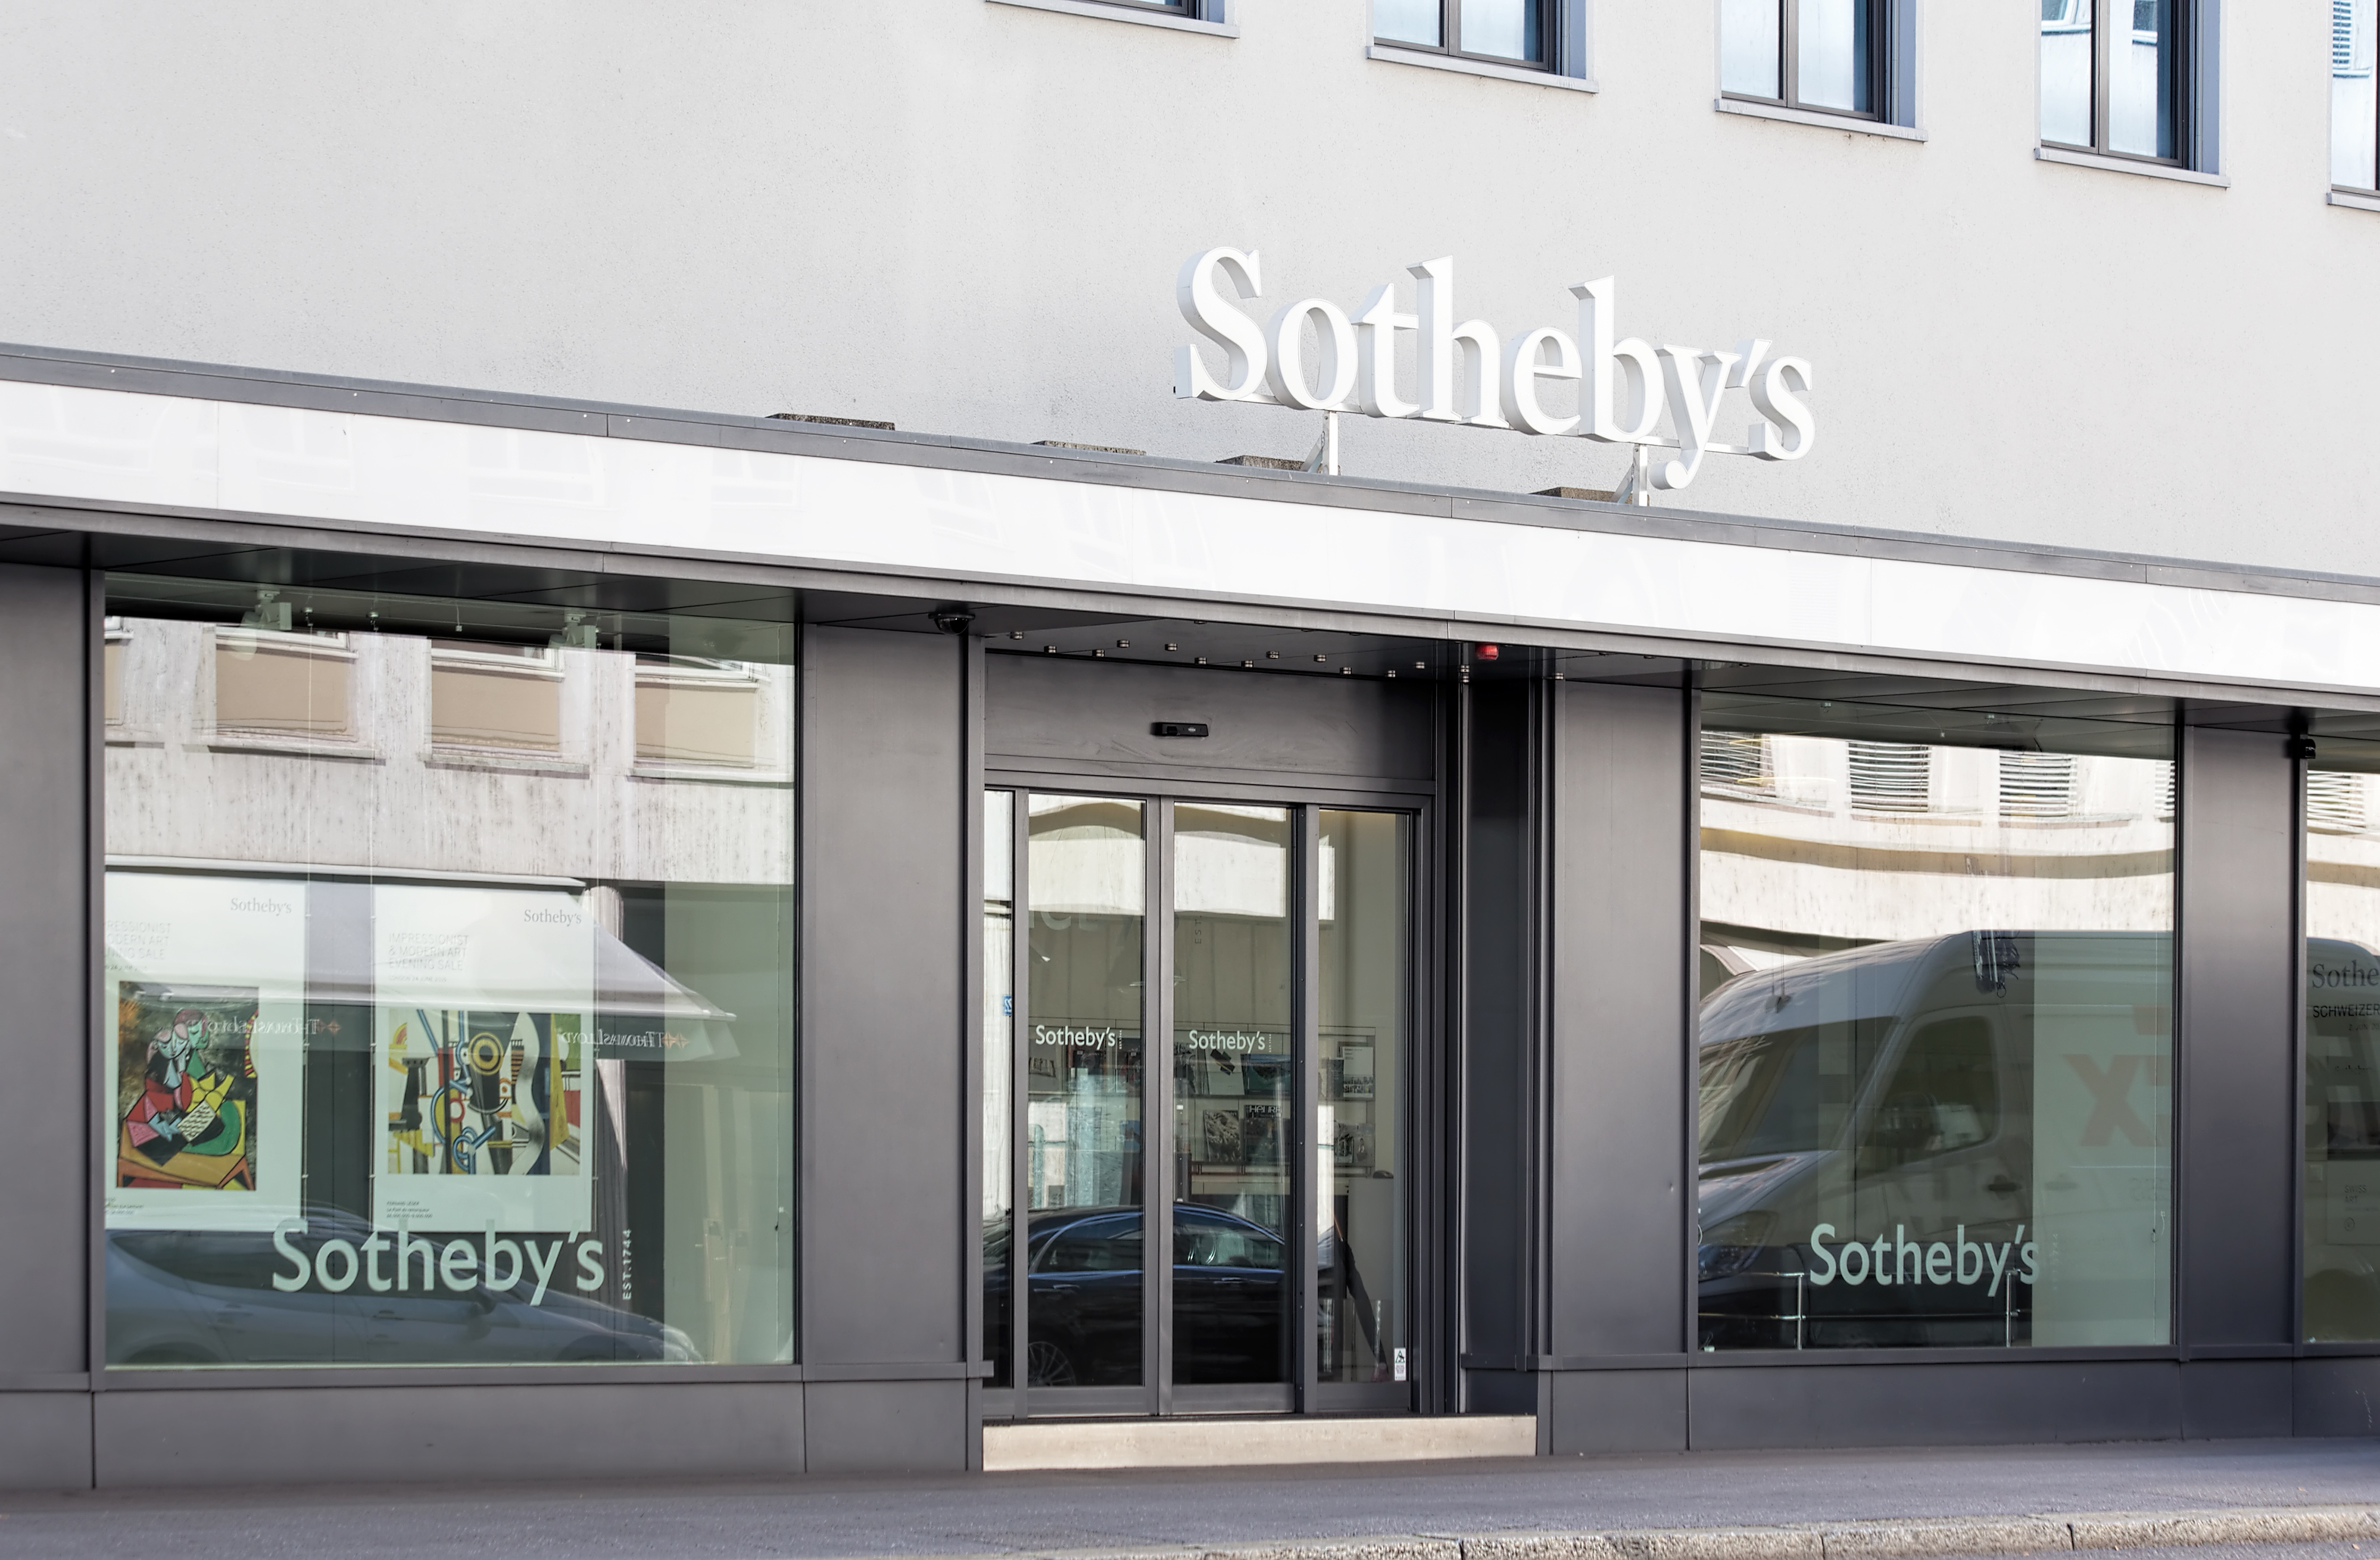 bigstock-Entrance-Of-The-Sotheby-s-Offi-94372688.jpg